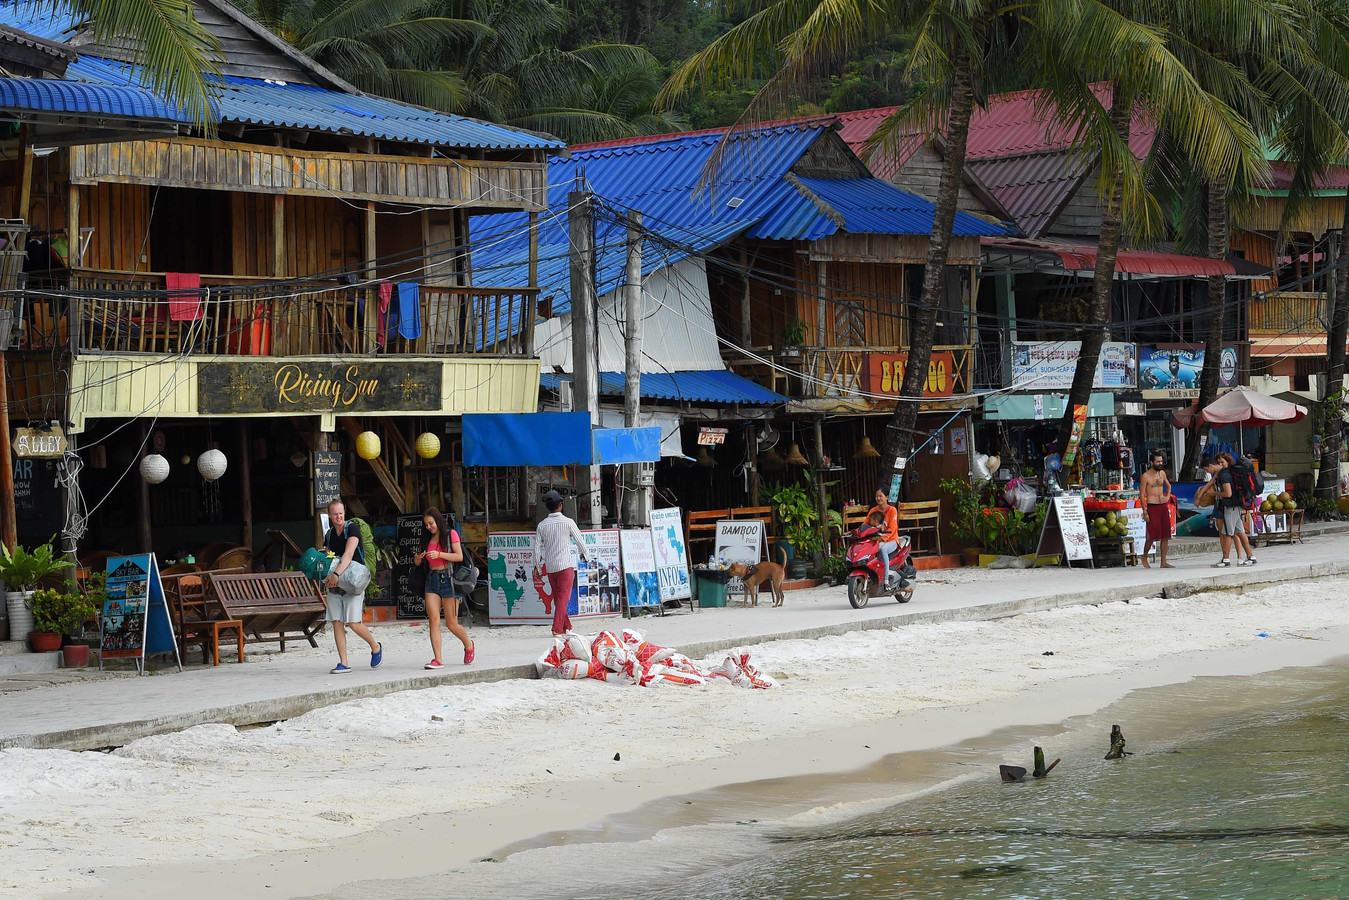 Toeristen op Koh Rong.